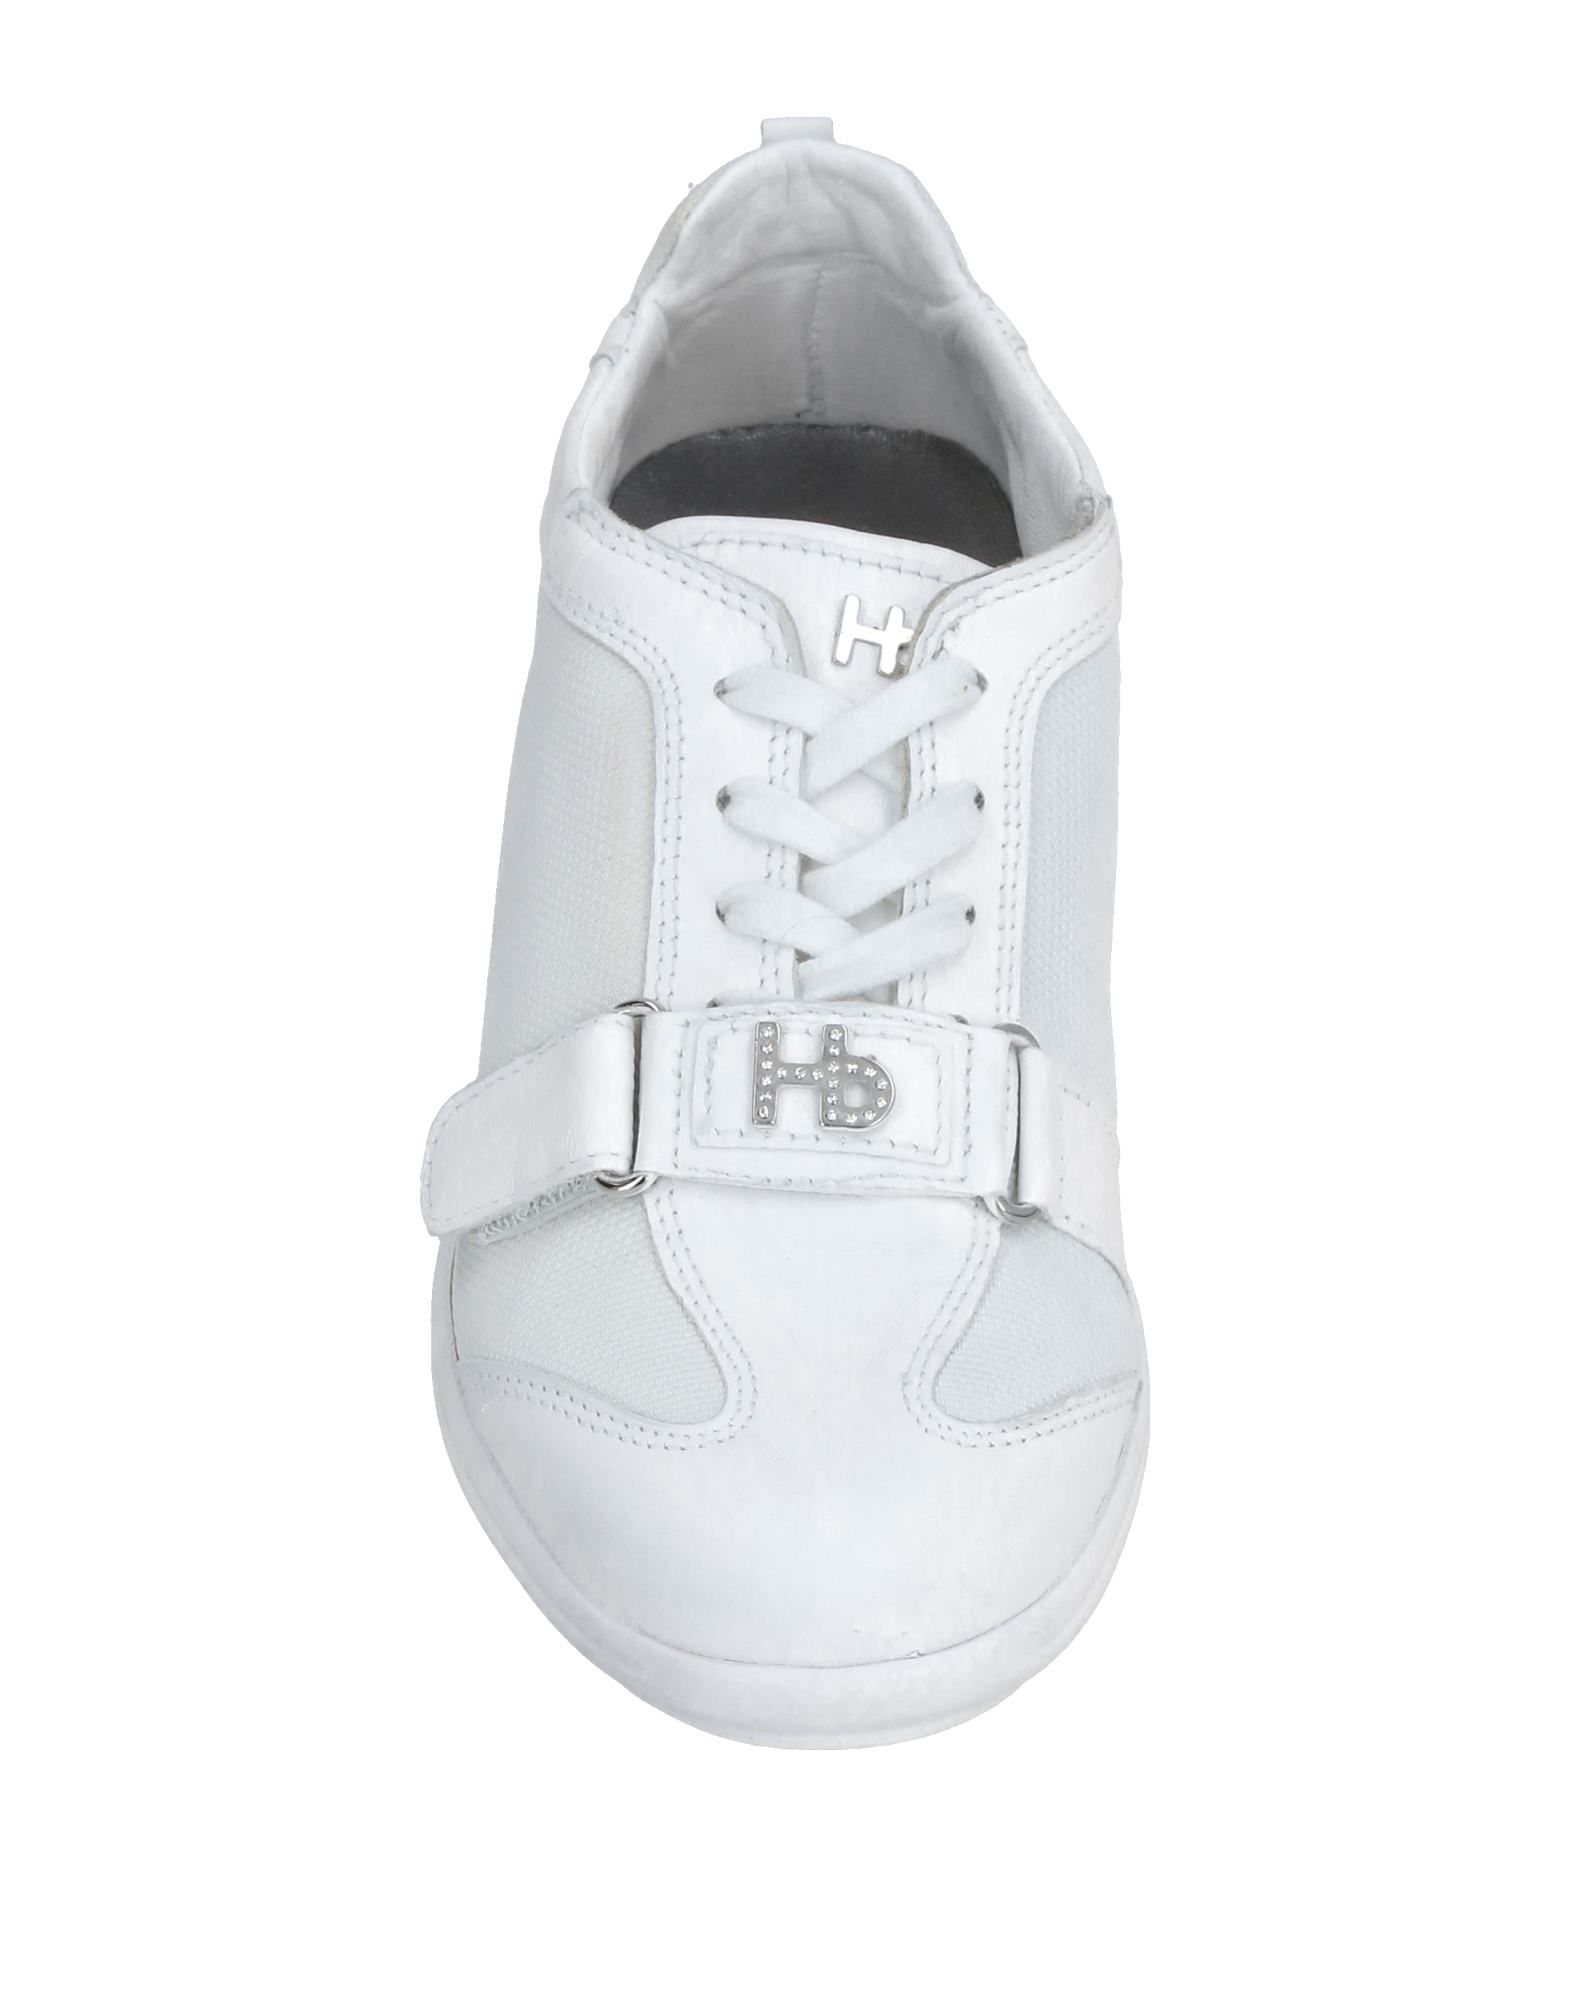 Hornet By Botticelli  Sneakers Damen  Botticelli 11360107TR Gute Qualität beliebte Schuhe 5df2a9